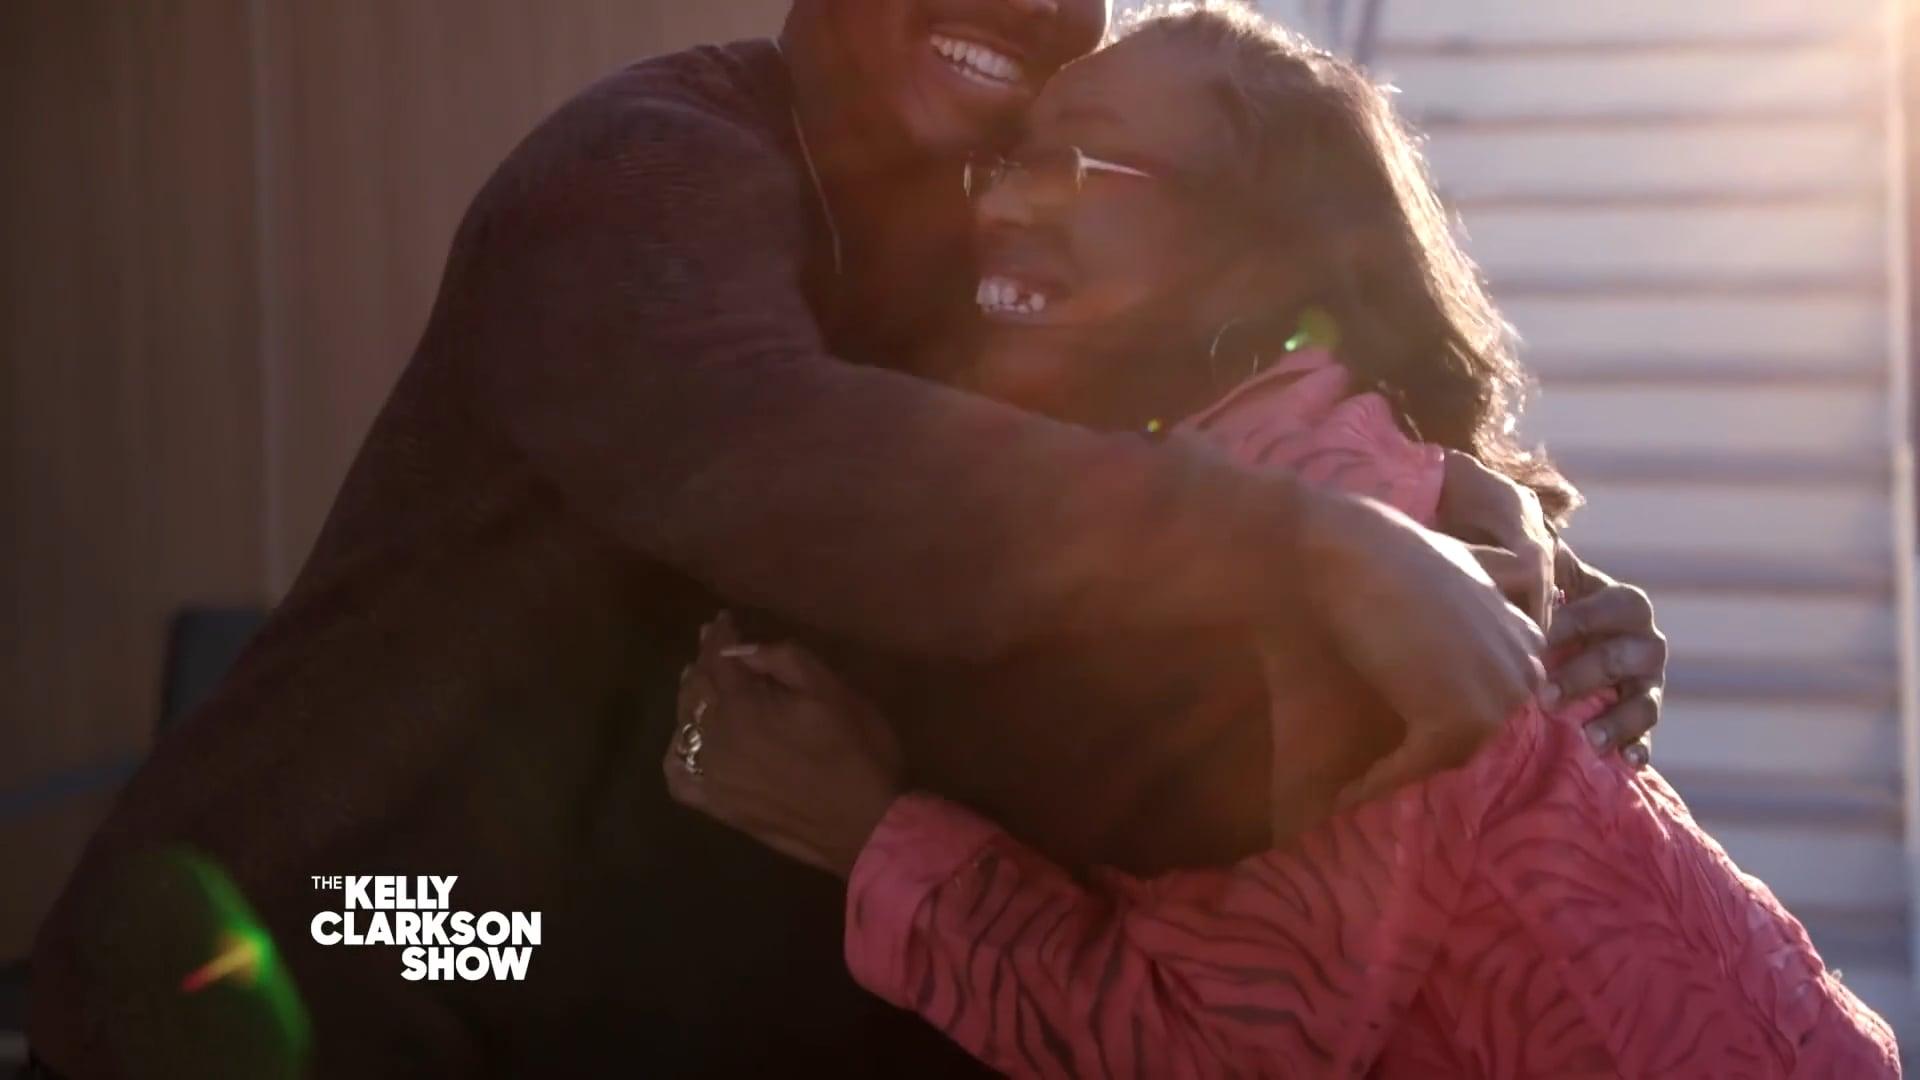 Kelly Clarkson Show - Pastor Michael Norwegian Cruise